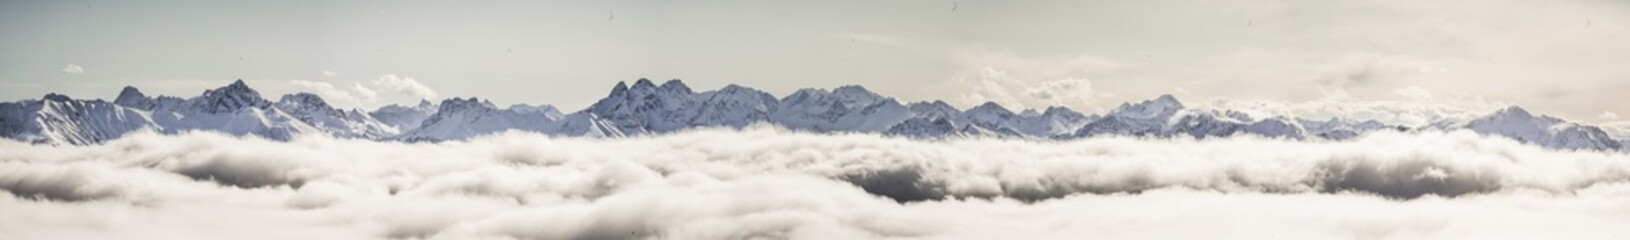 Big Panorama of snowy allgäuer alps Wall mural